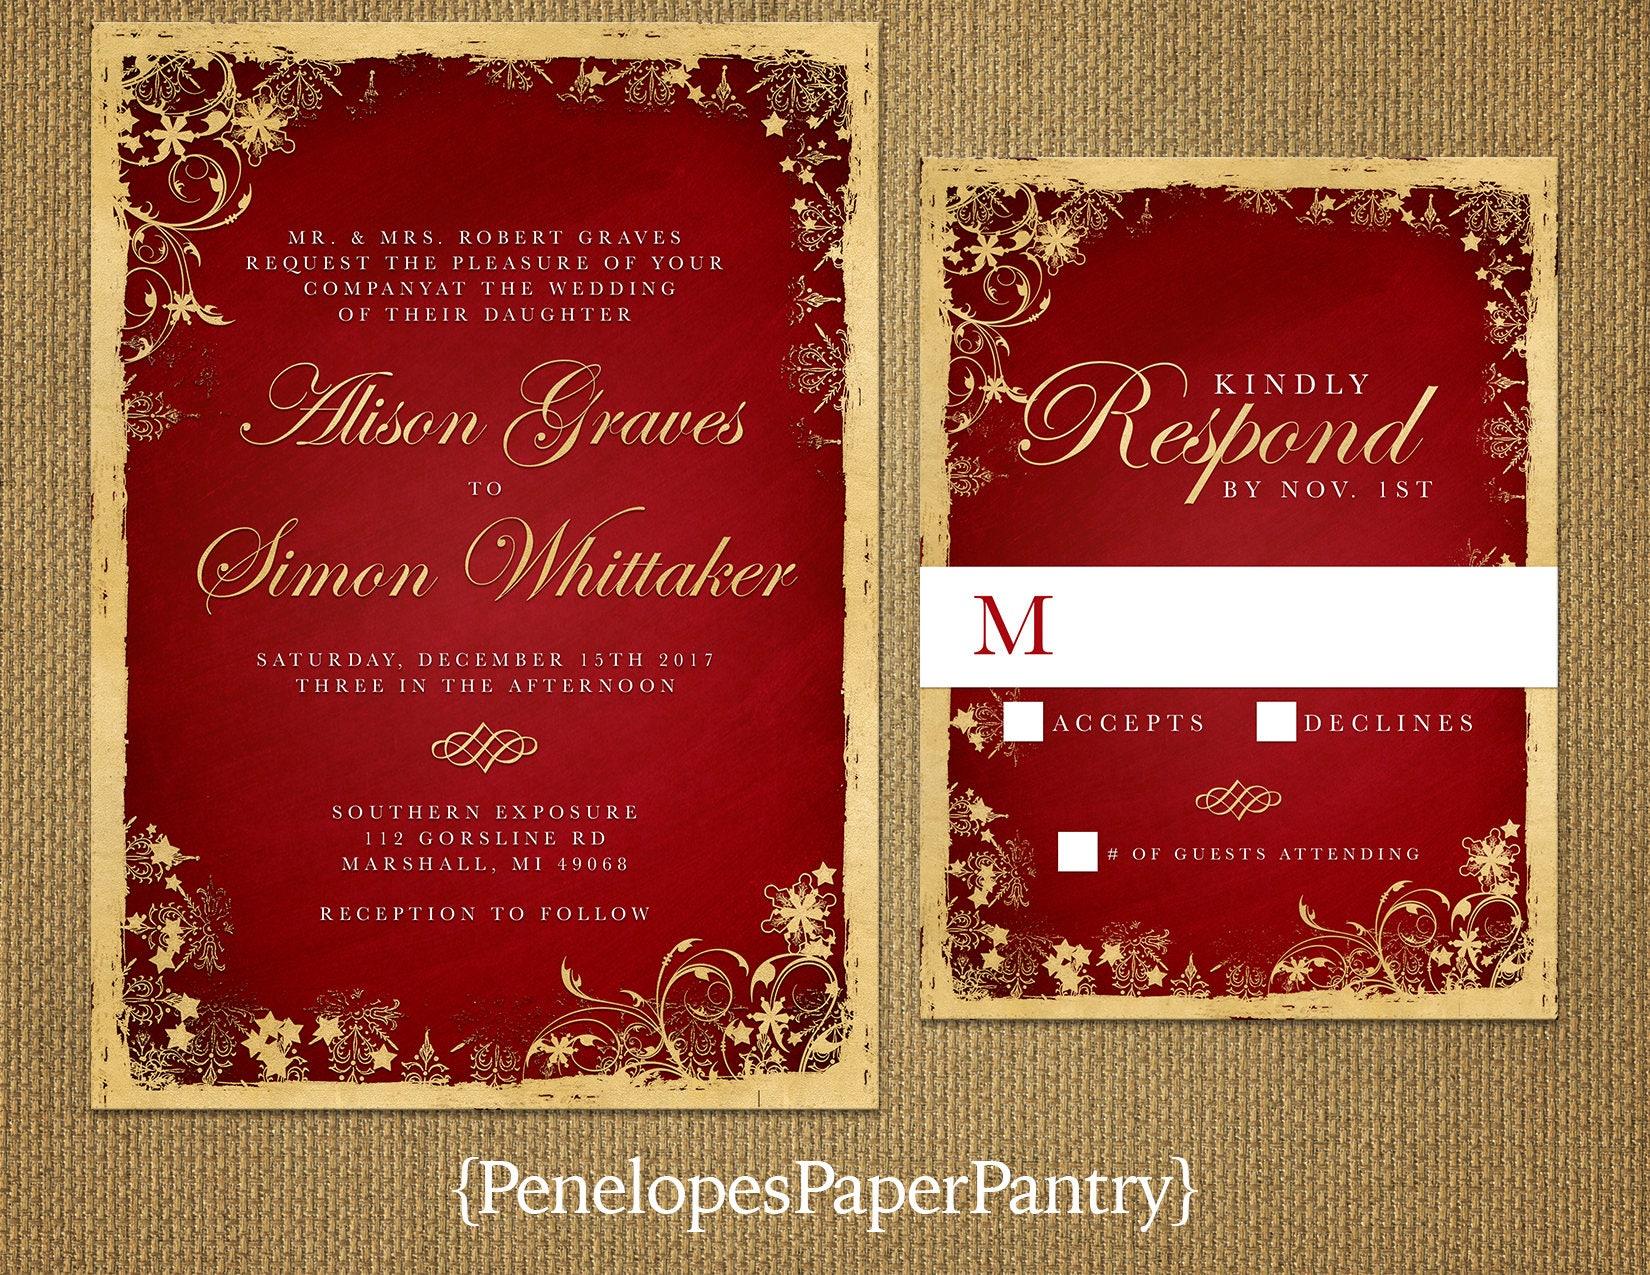 Elegant Christmas Wedding InvitationRedGoldRed and